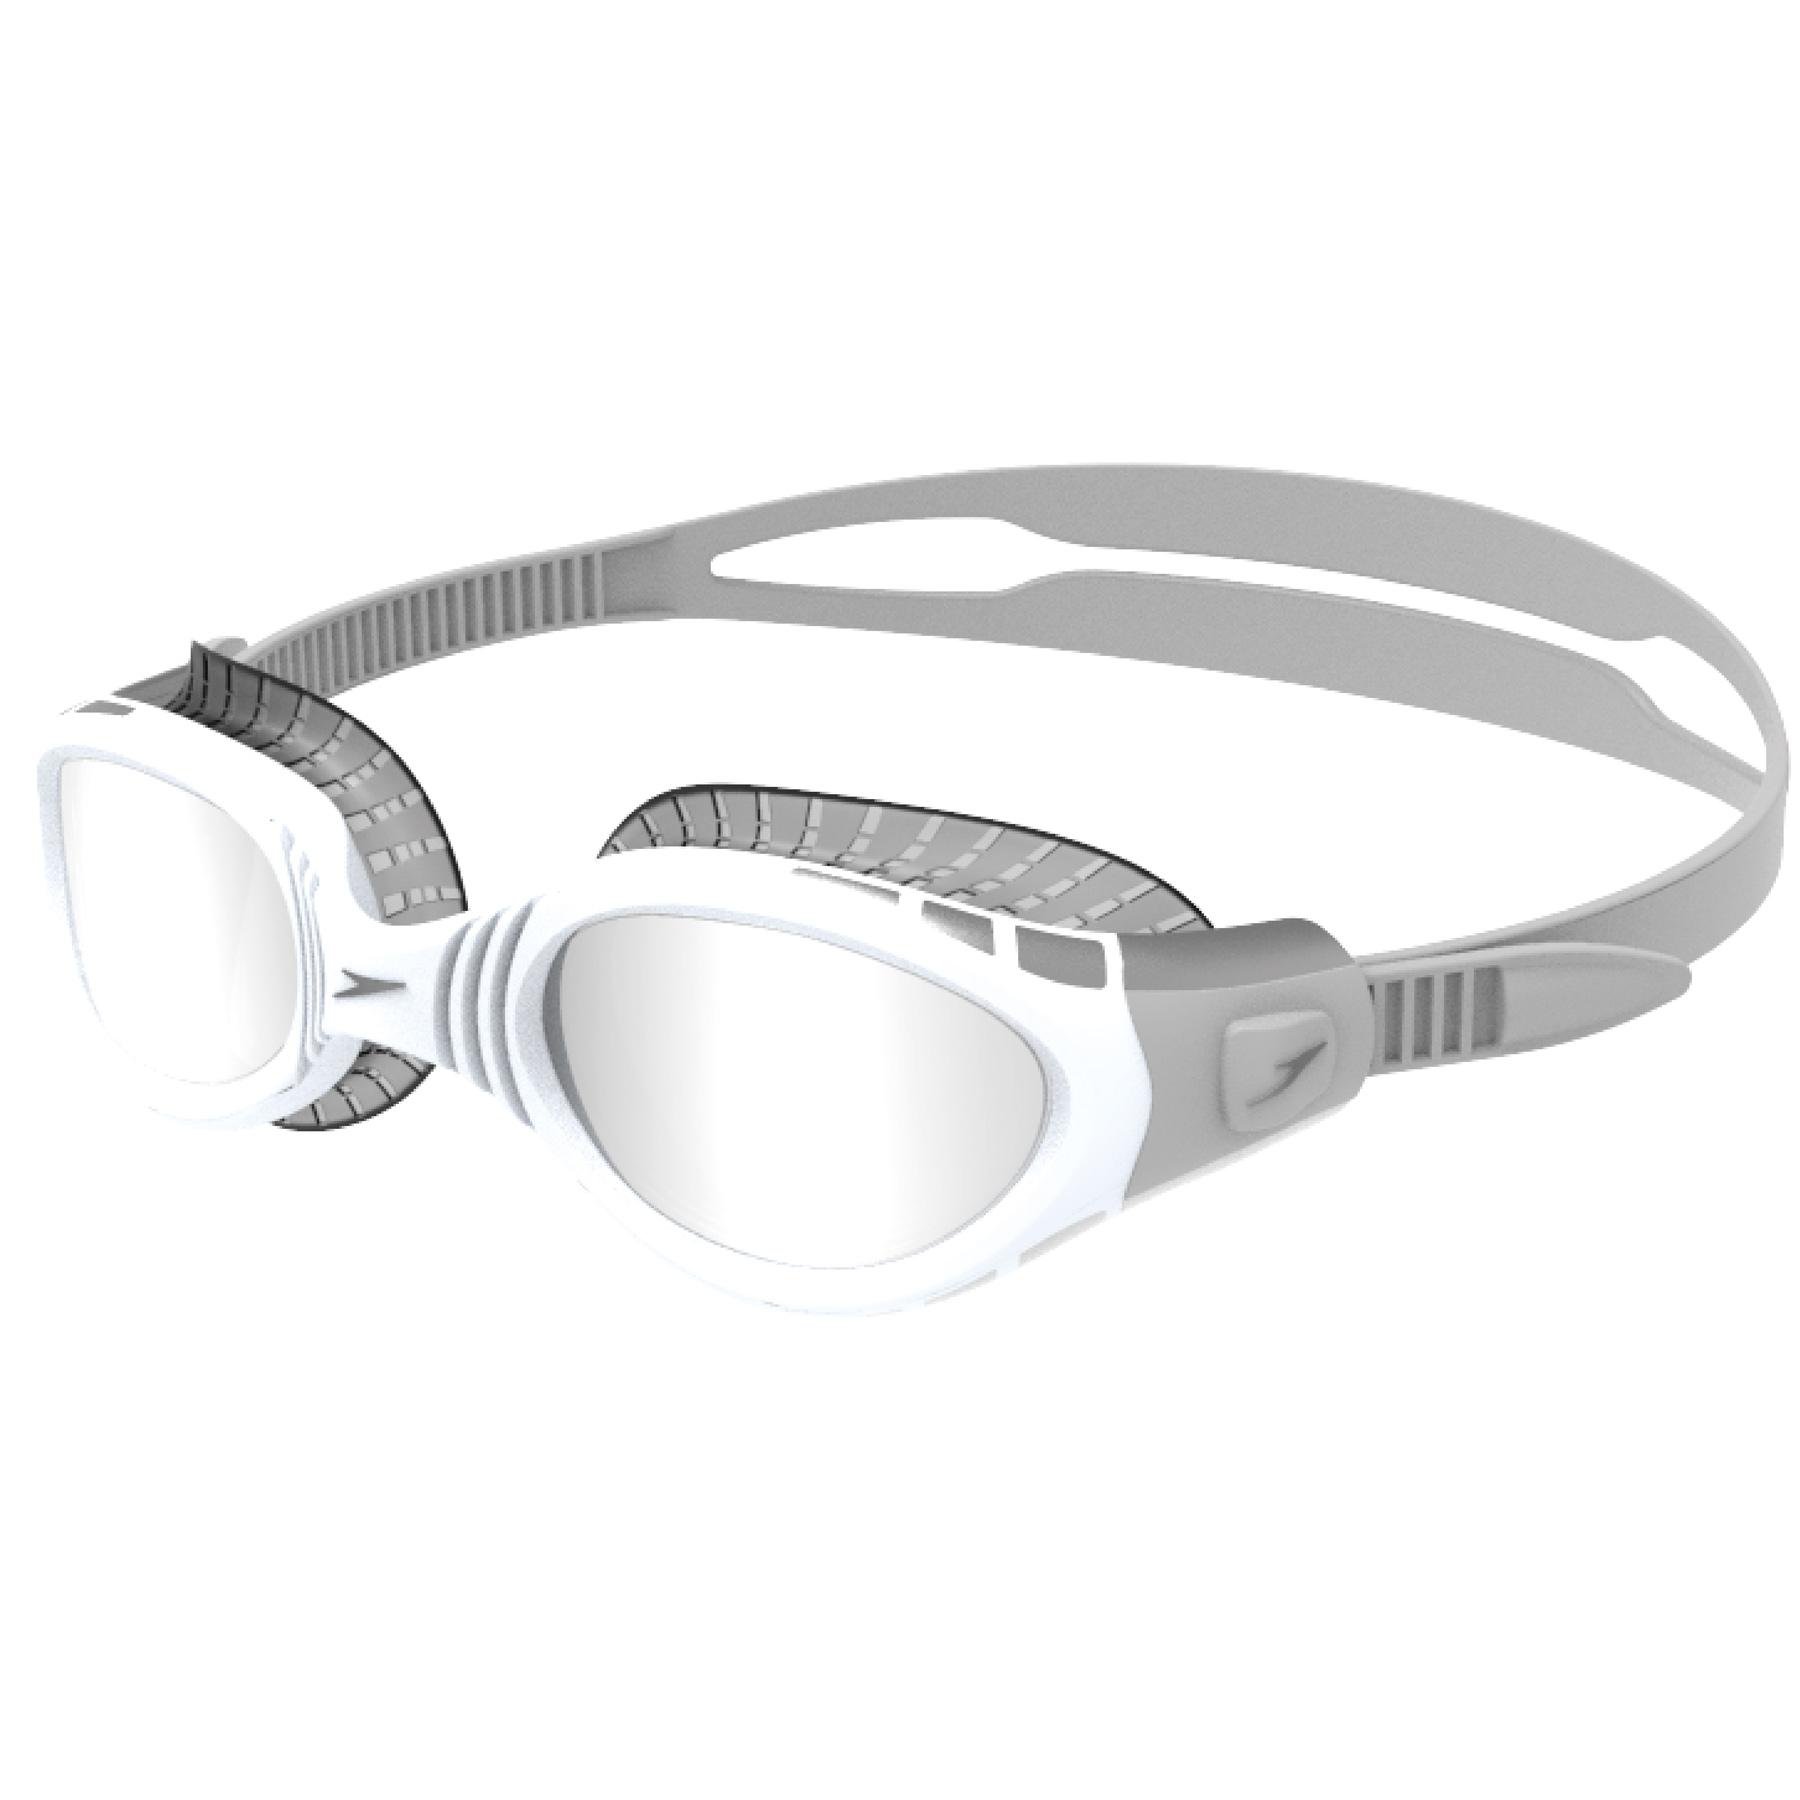 Speedo Futura Biofuse Mirror Flexiseal Cool Grey/White/Silver Schwimmbrille